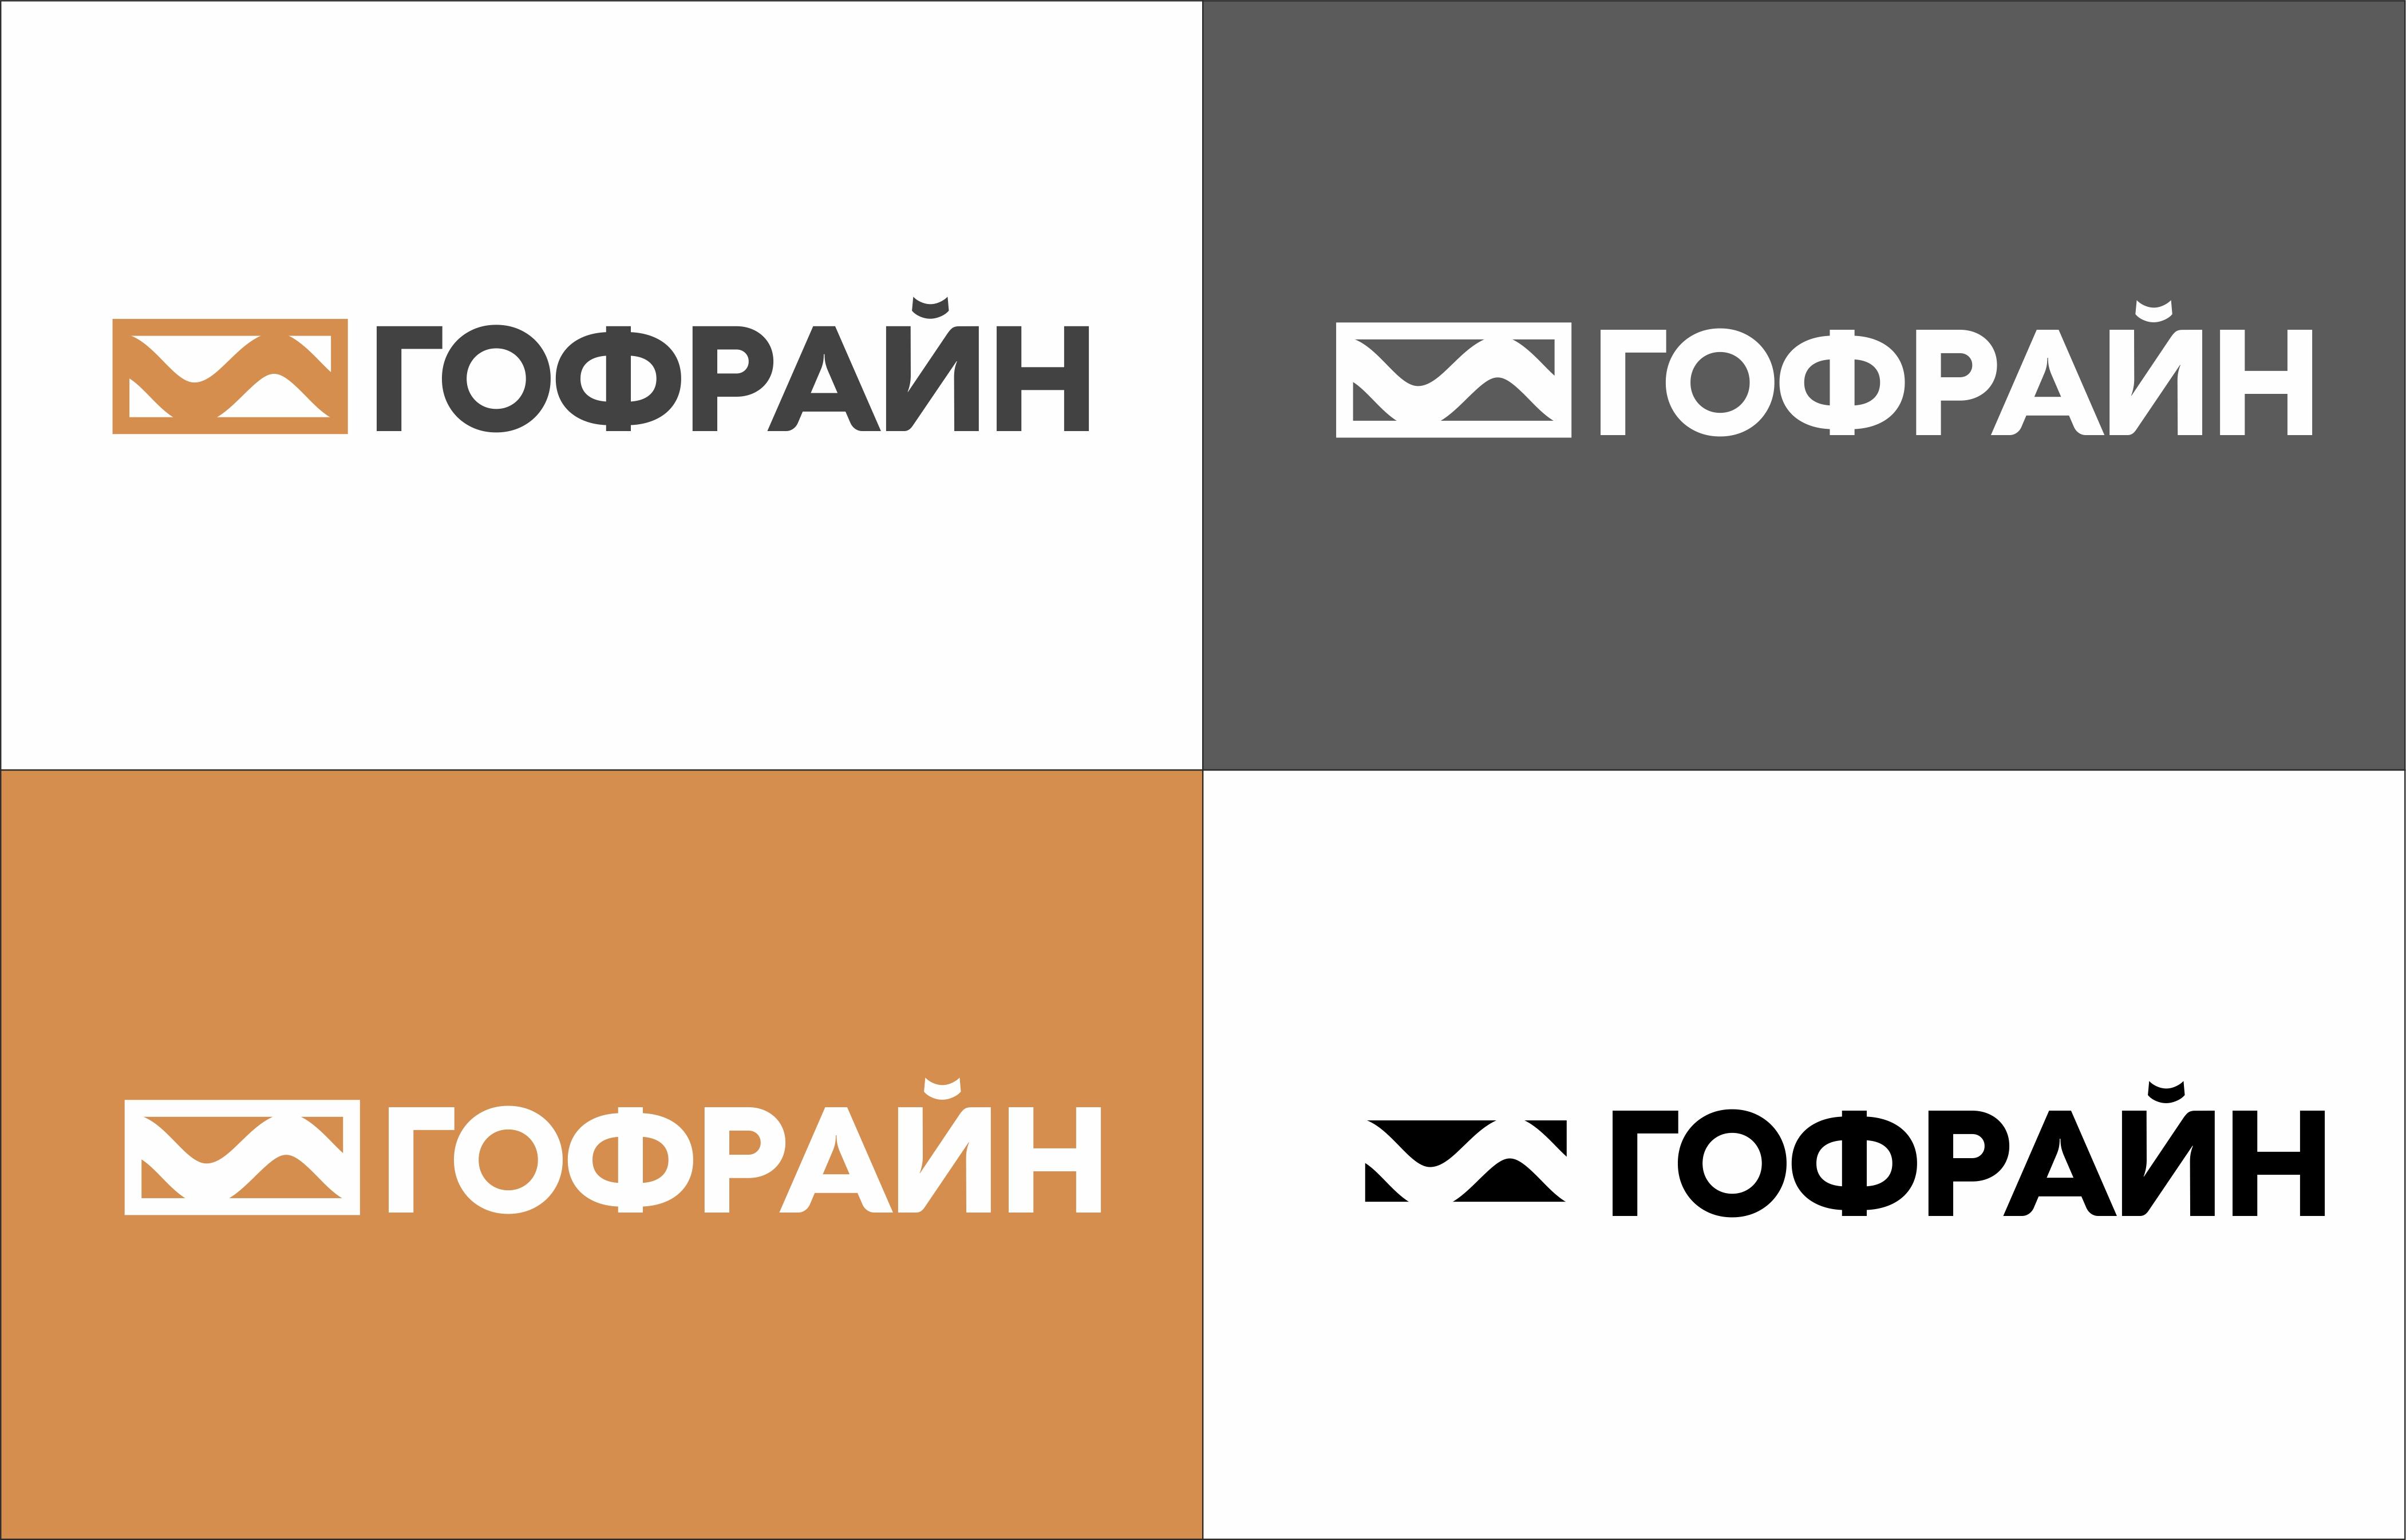 Логотип для компании по реализации упаковки из гофрокартона фото f_6405cdba9afdd82d.jpg